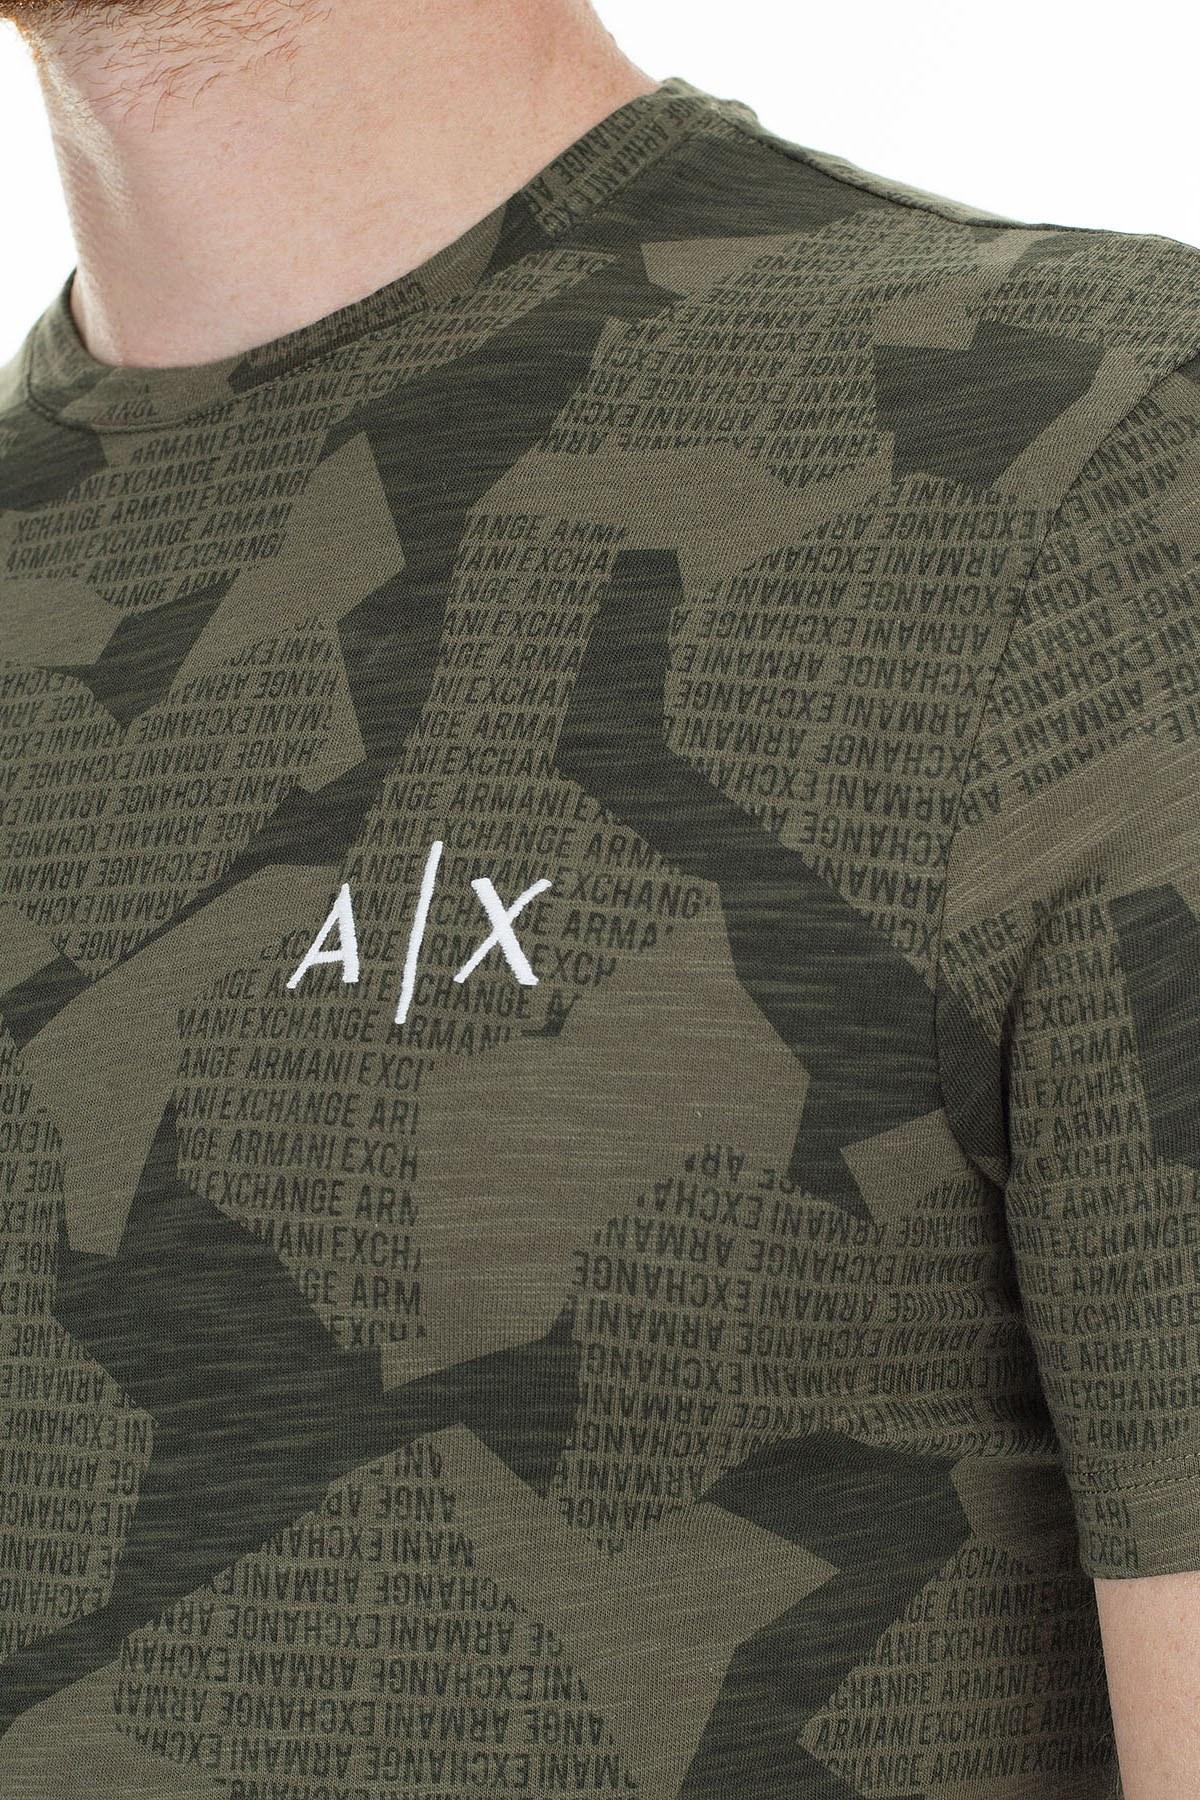 Armani Exchange Logo Baskılı % 100 Pamuk Bisiklet Yaka Erkek T Shirt 3HZTHA ZJ7DZ 2889 YEŞİL